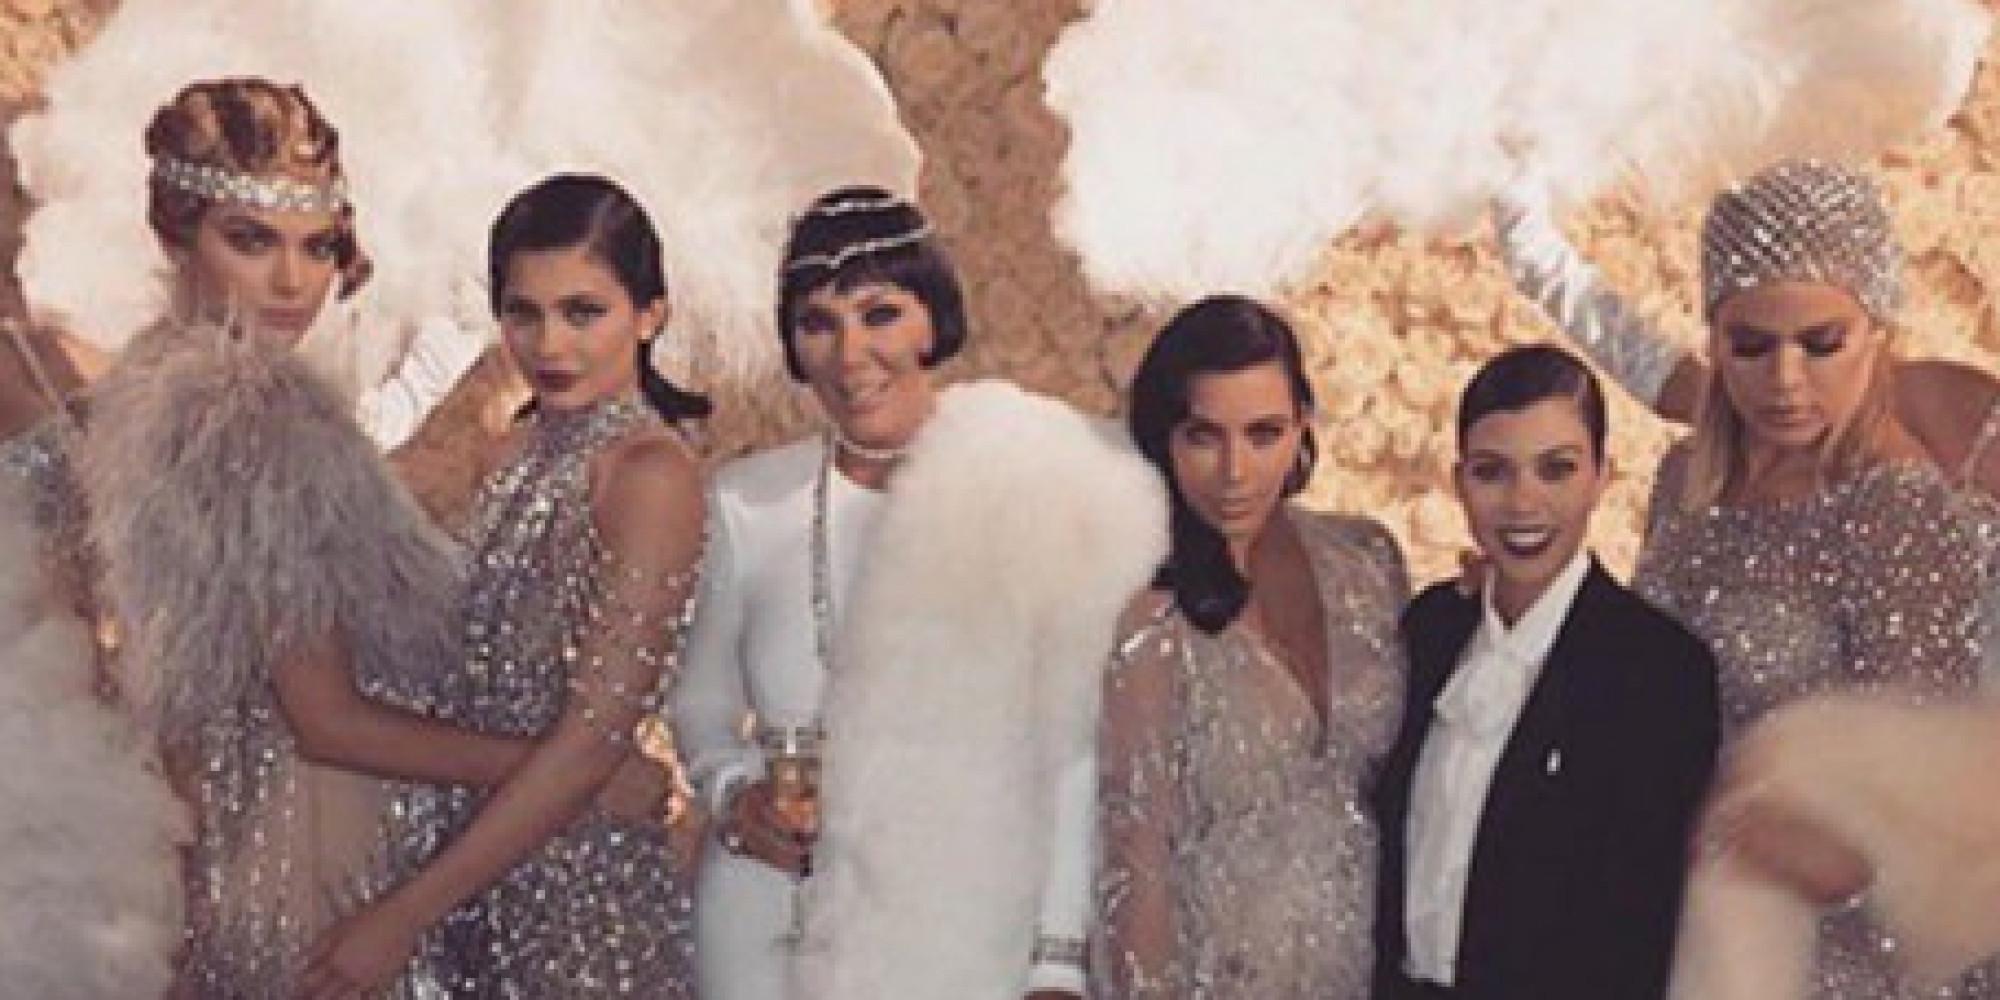 Kardashian Family 2013 Christmas Card - The Kardashians\' 2013 ...